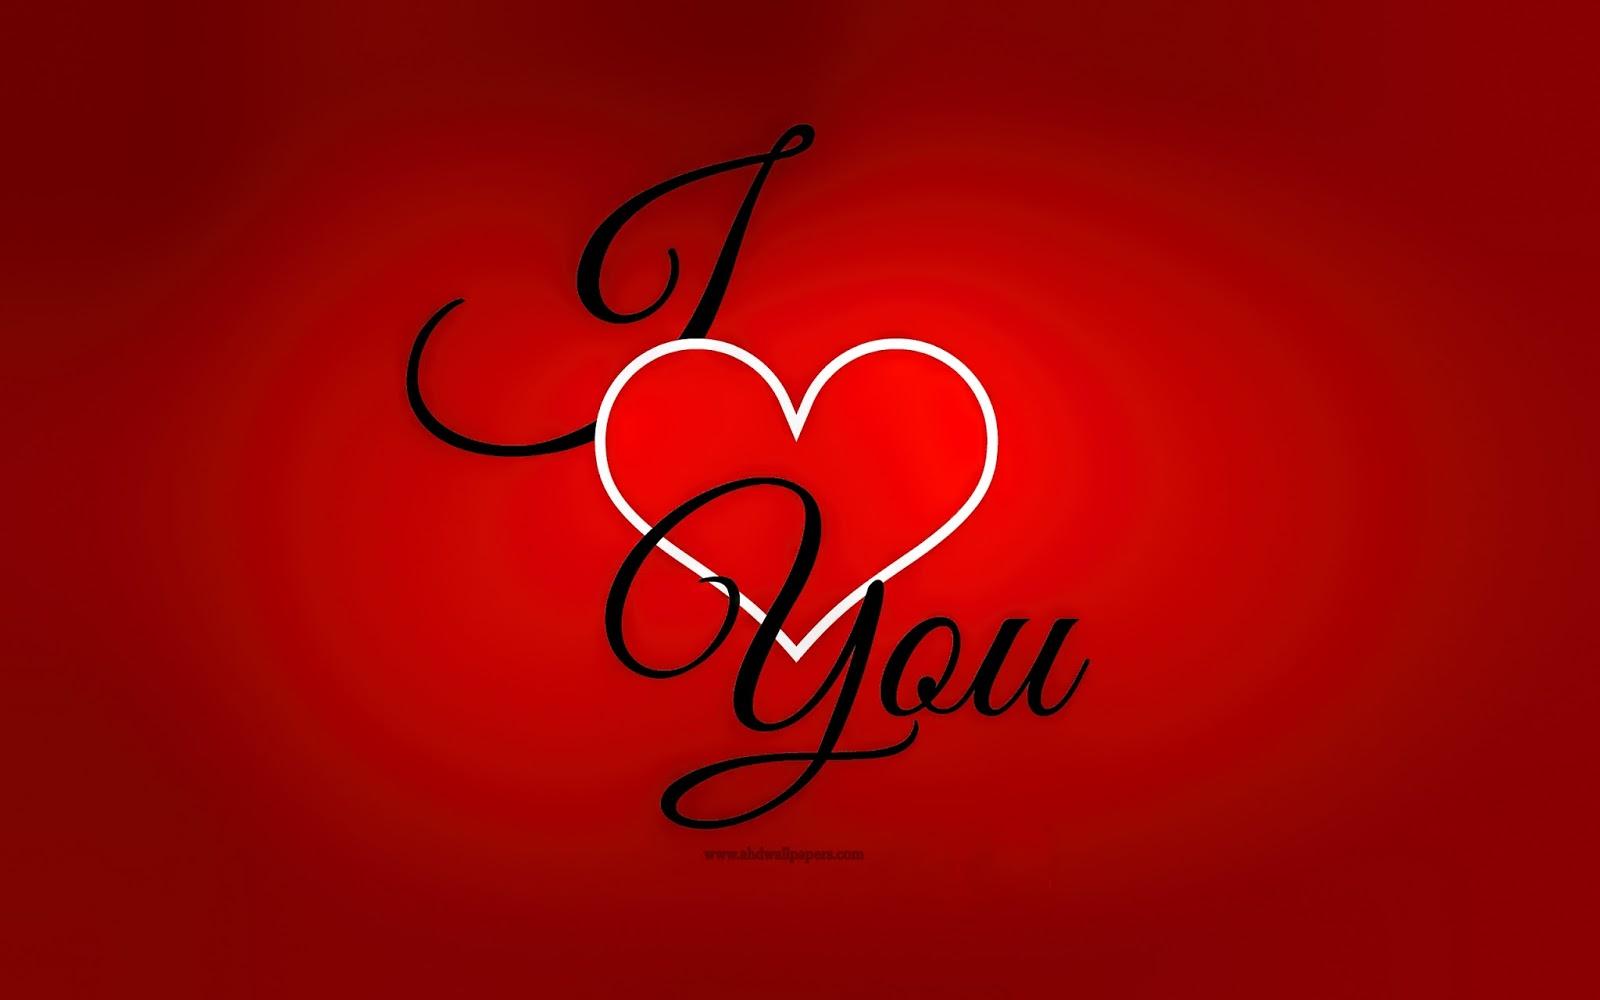 Wallpaper download i love you - I Love You Wallpaper Download